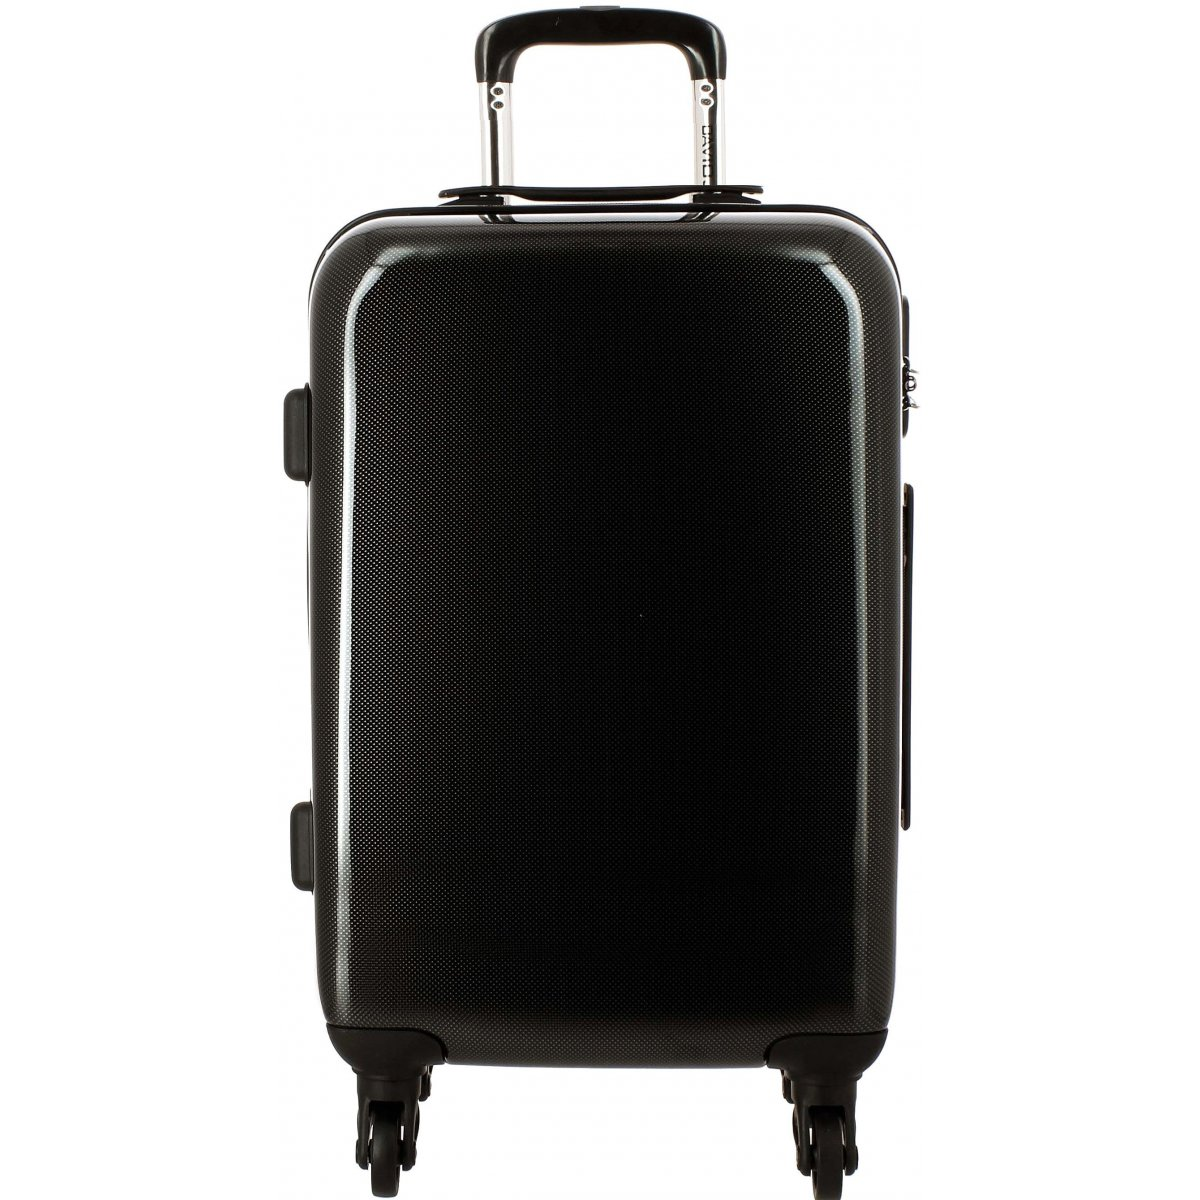 valise rigide david jones taille m 66cm ba20601m. Black Bedroom Furniture Sets. Home Design Ideas